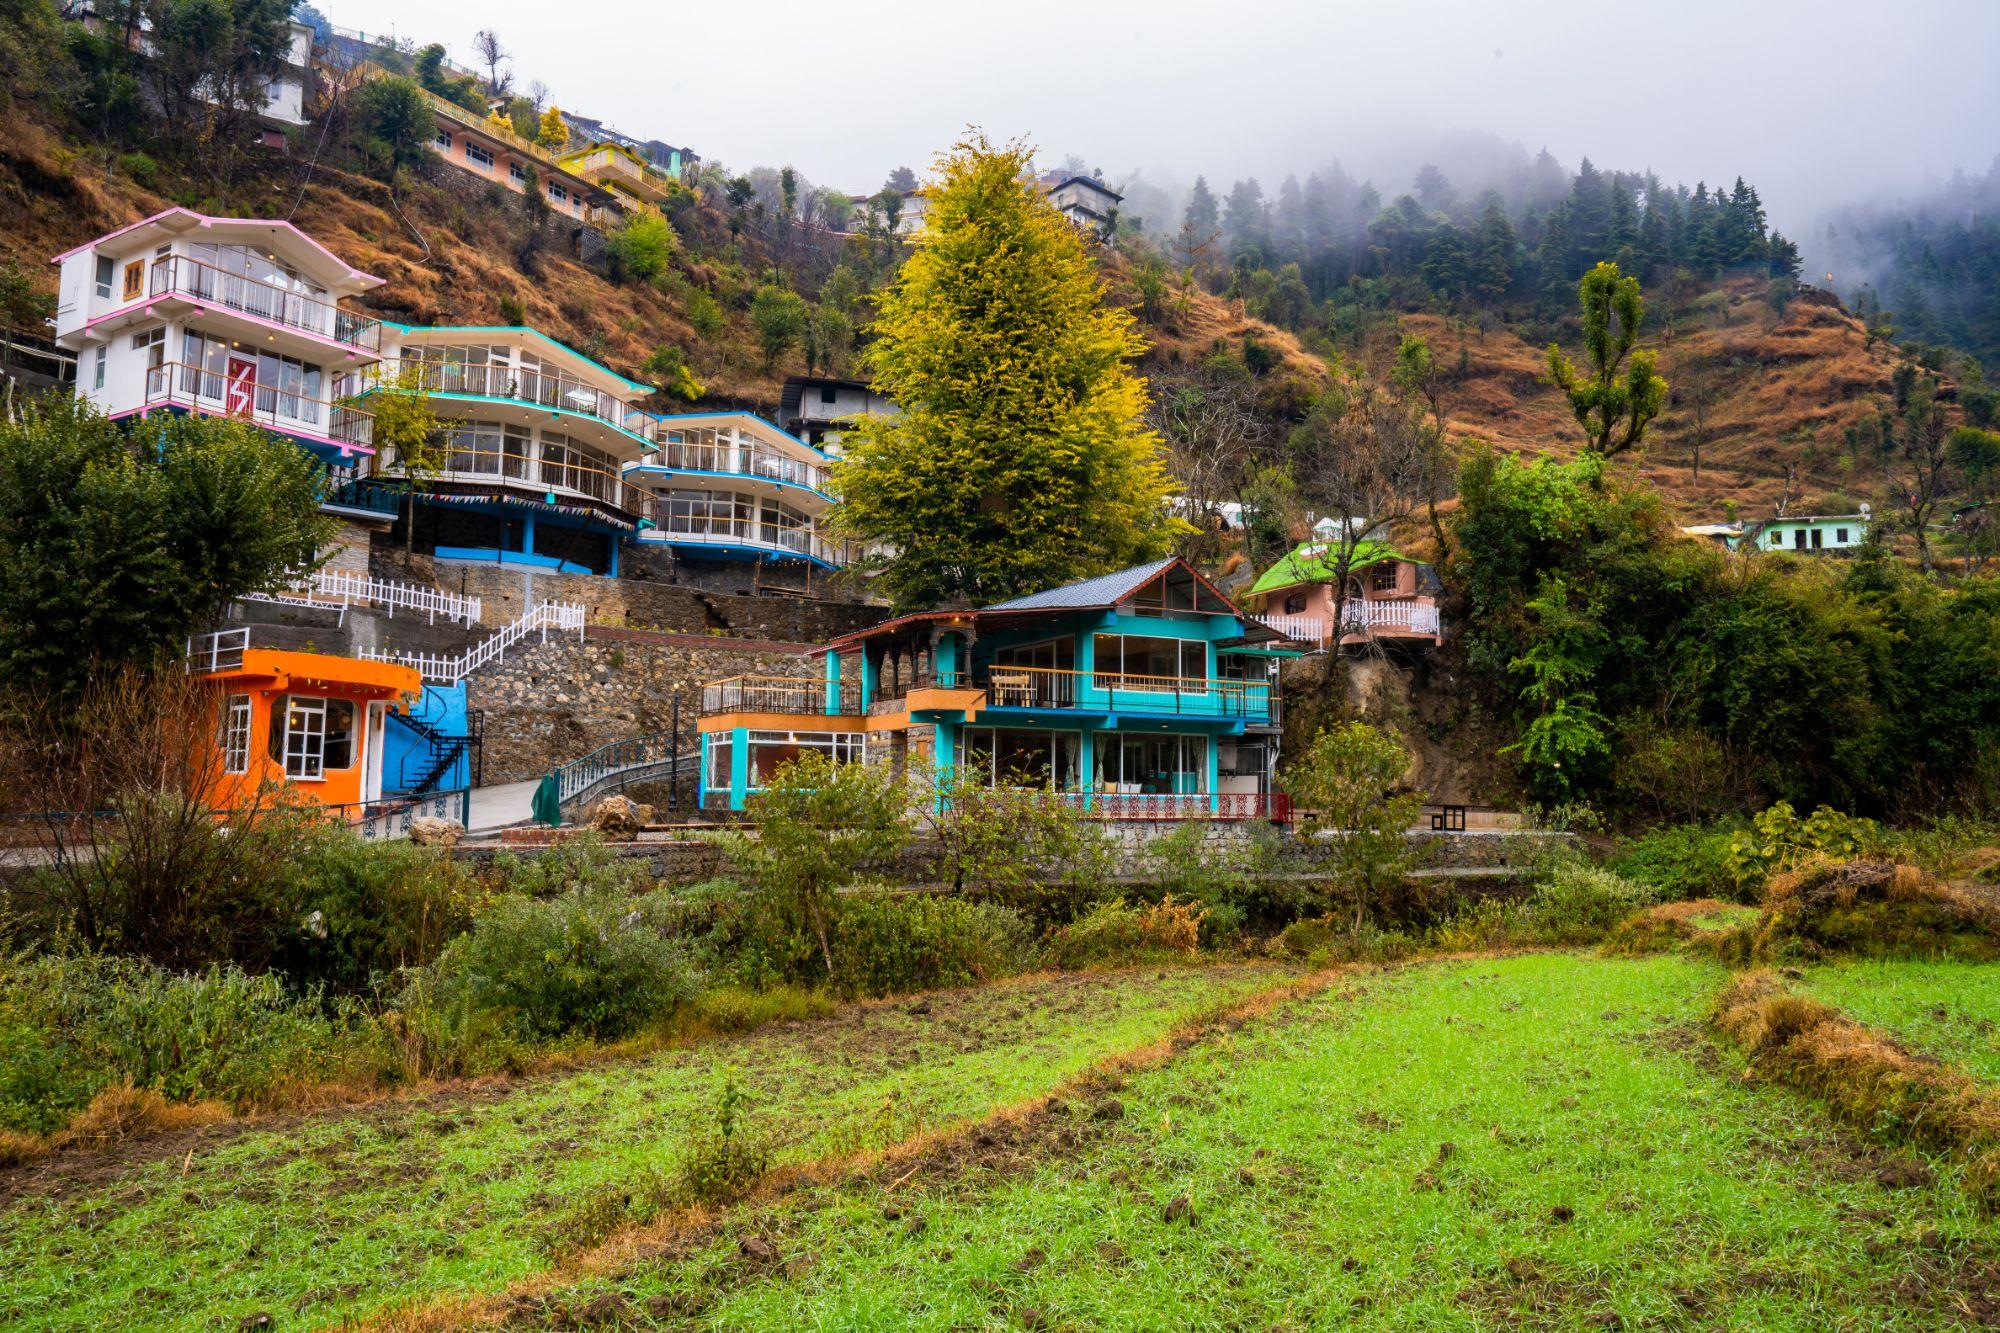 Zostel Mussoorie, best backpacking hostel in Dehradun Mussoorie Uttarakhand